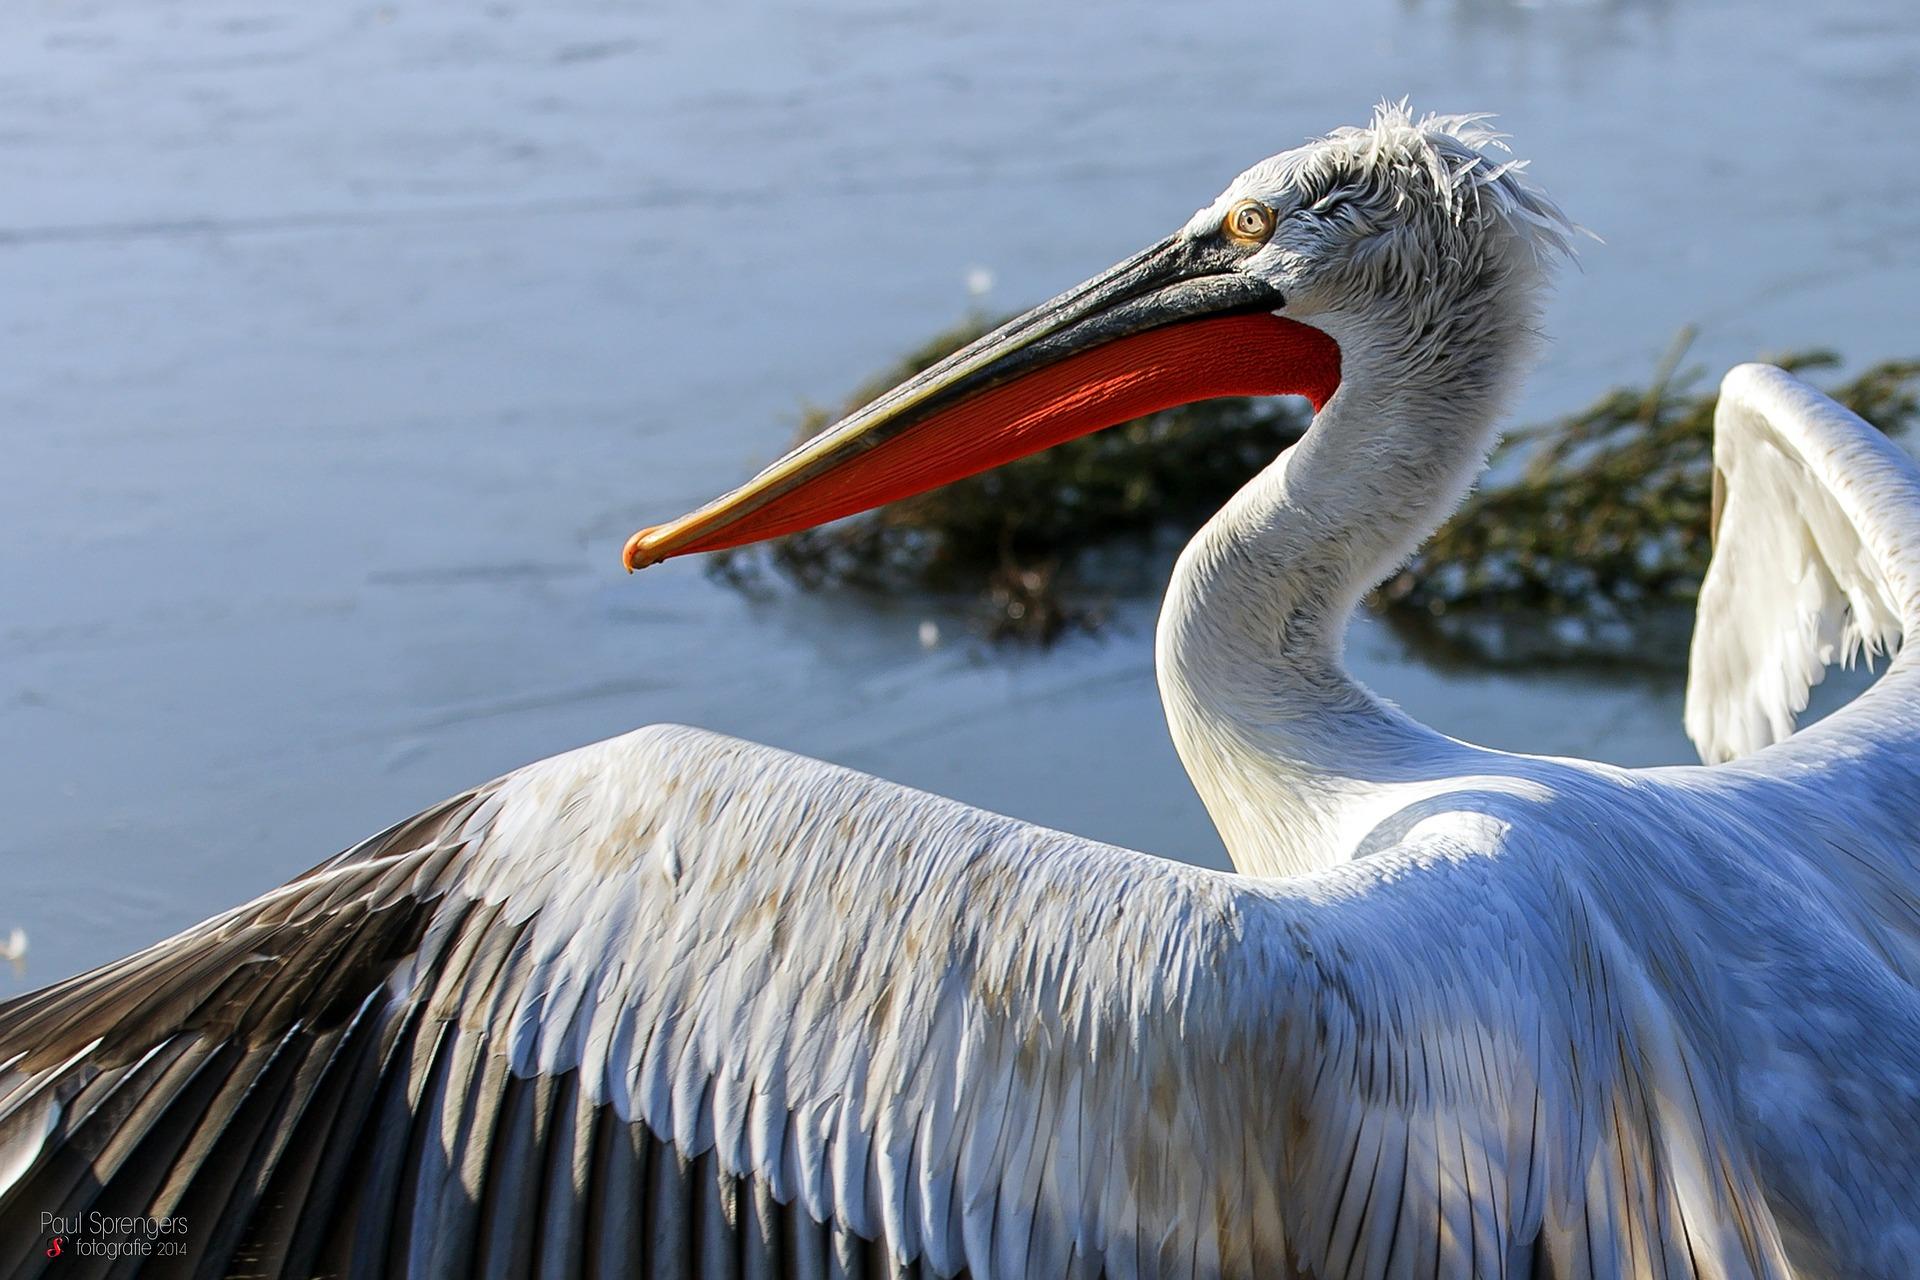 dalmatian-pelican-259155_1920